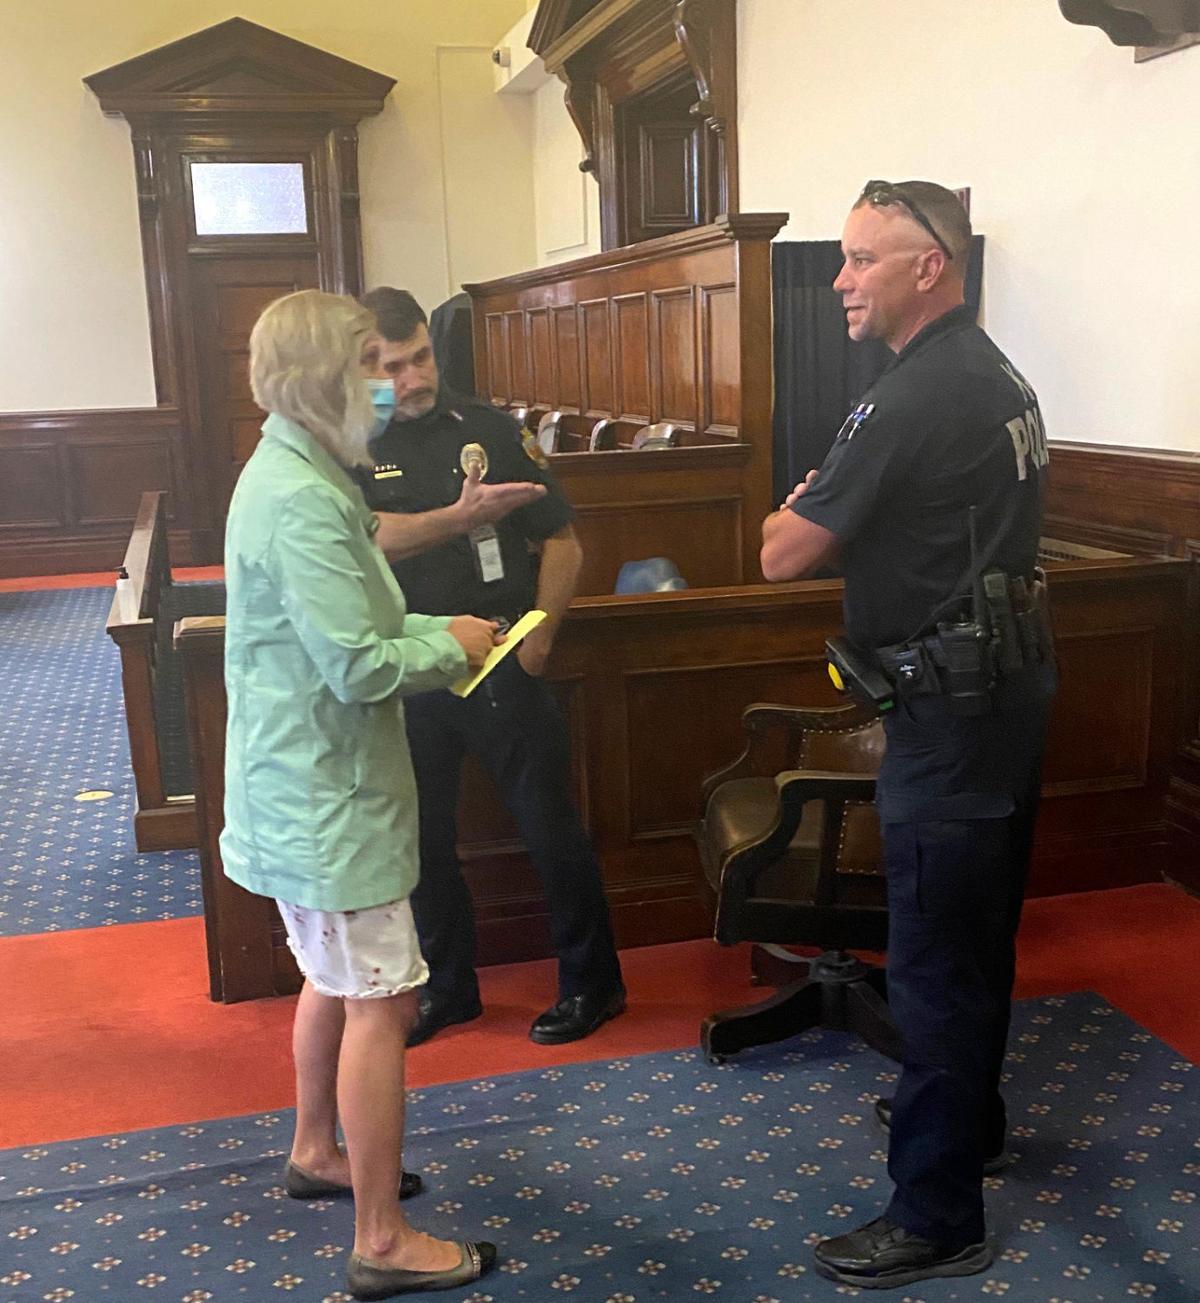 Trandahl escorted to jail